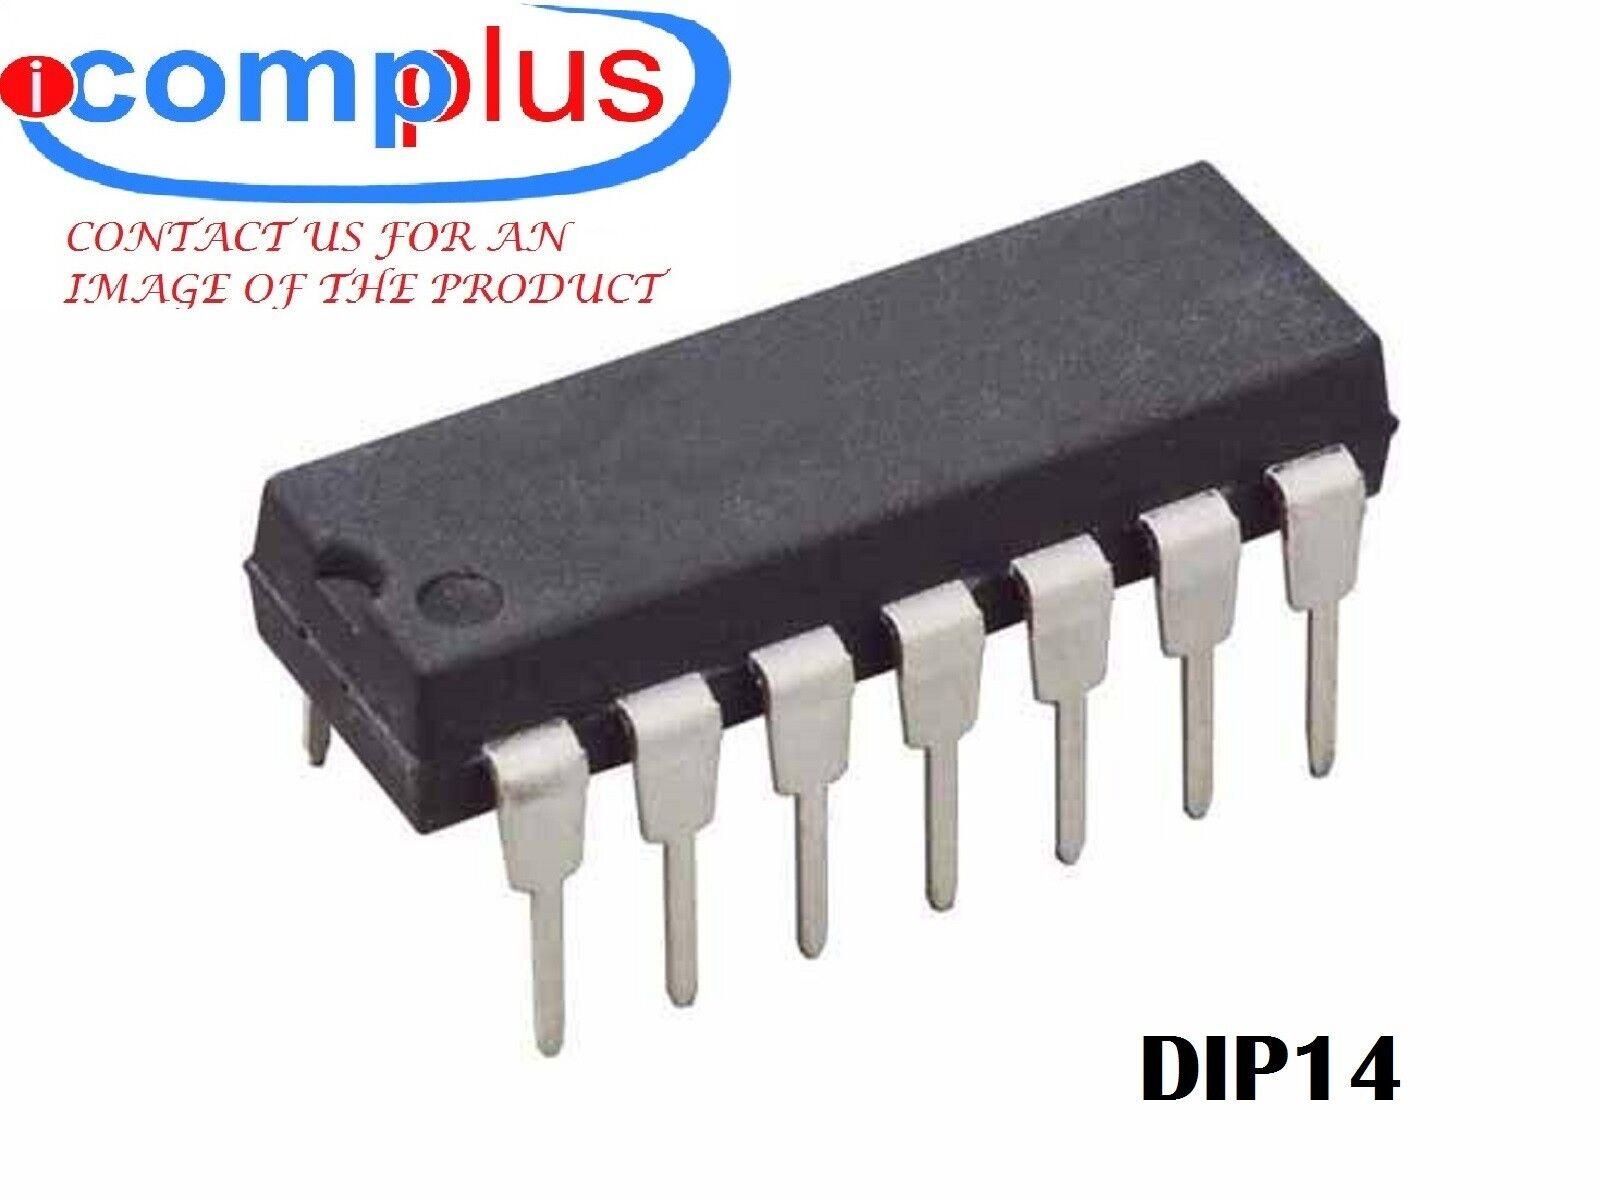 Inductor de ferrita SMD 0805 10x LQM21NNR22K10D 220nH 250 mA 0.38Ω ftest 25 MHz